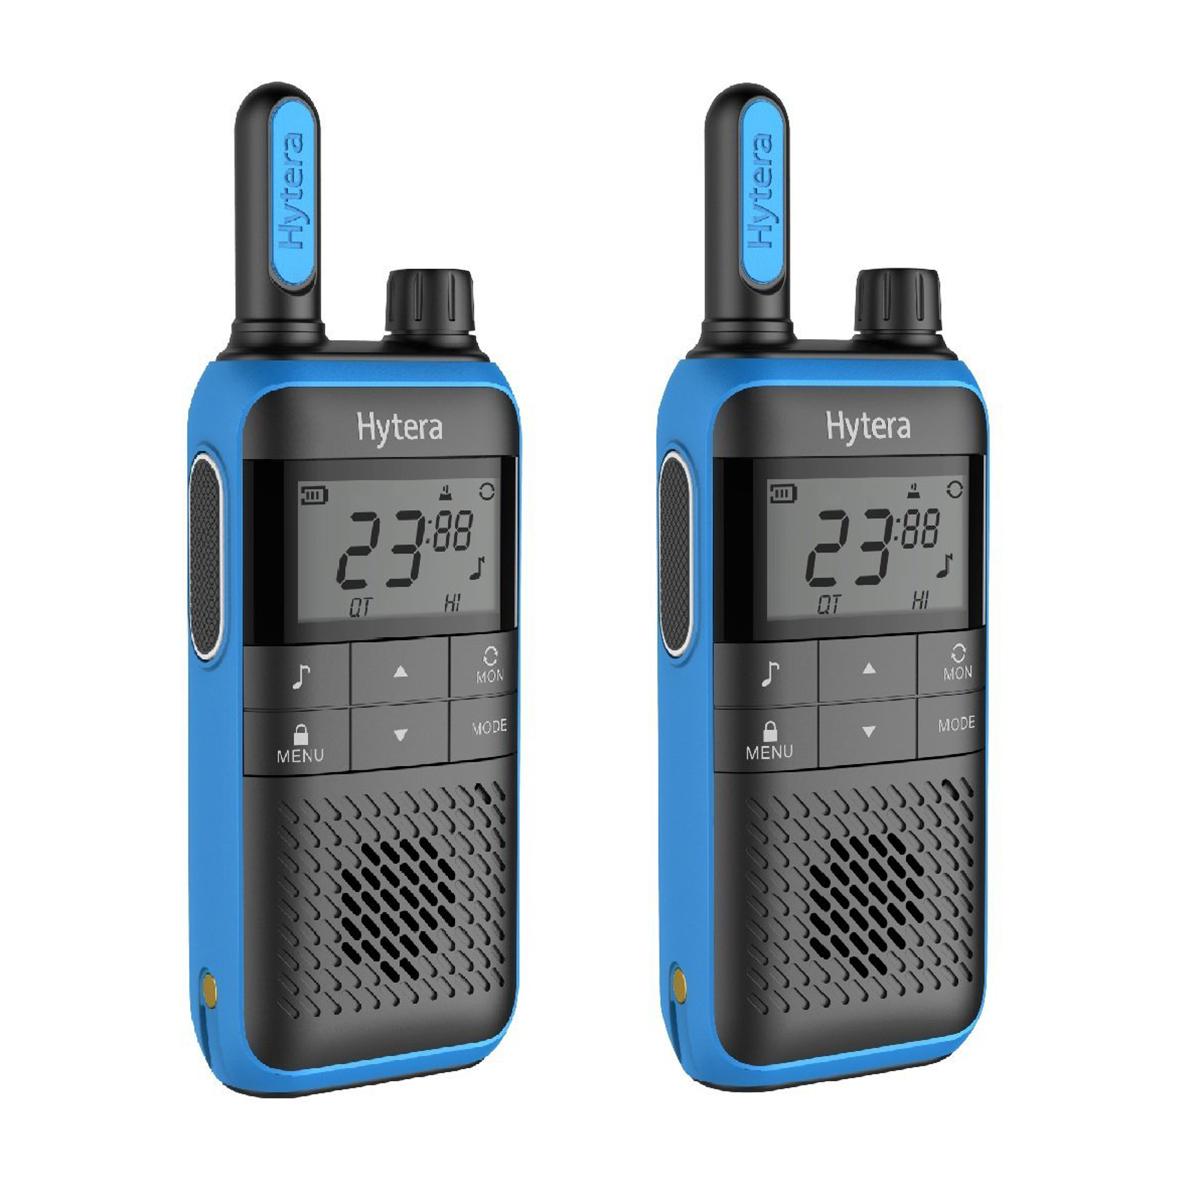 Hytera Push 2 Talk TF515 2 Way Radio Twin Pack